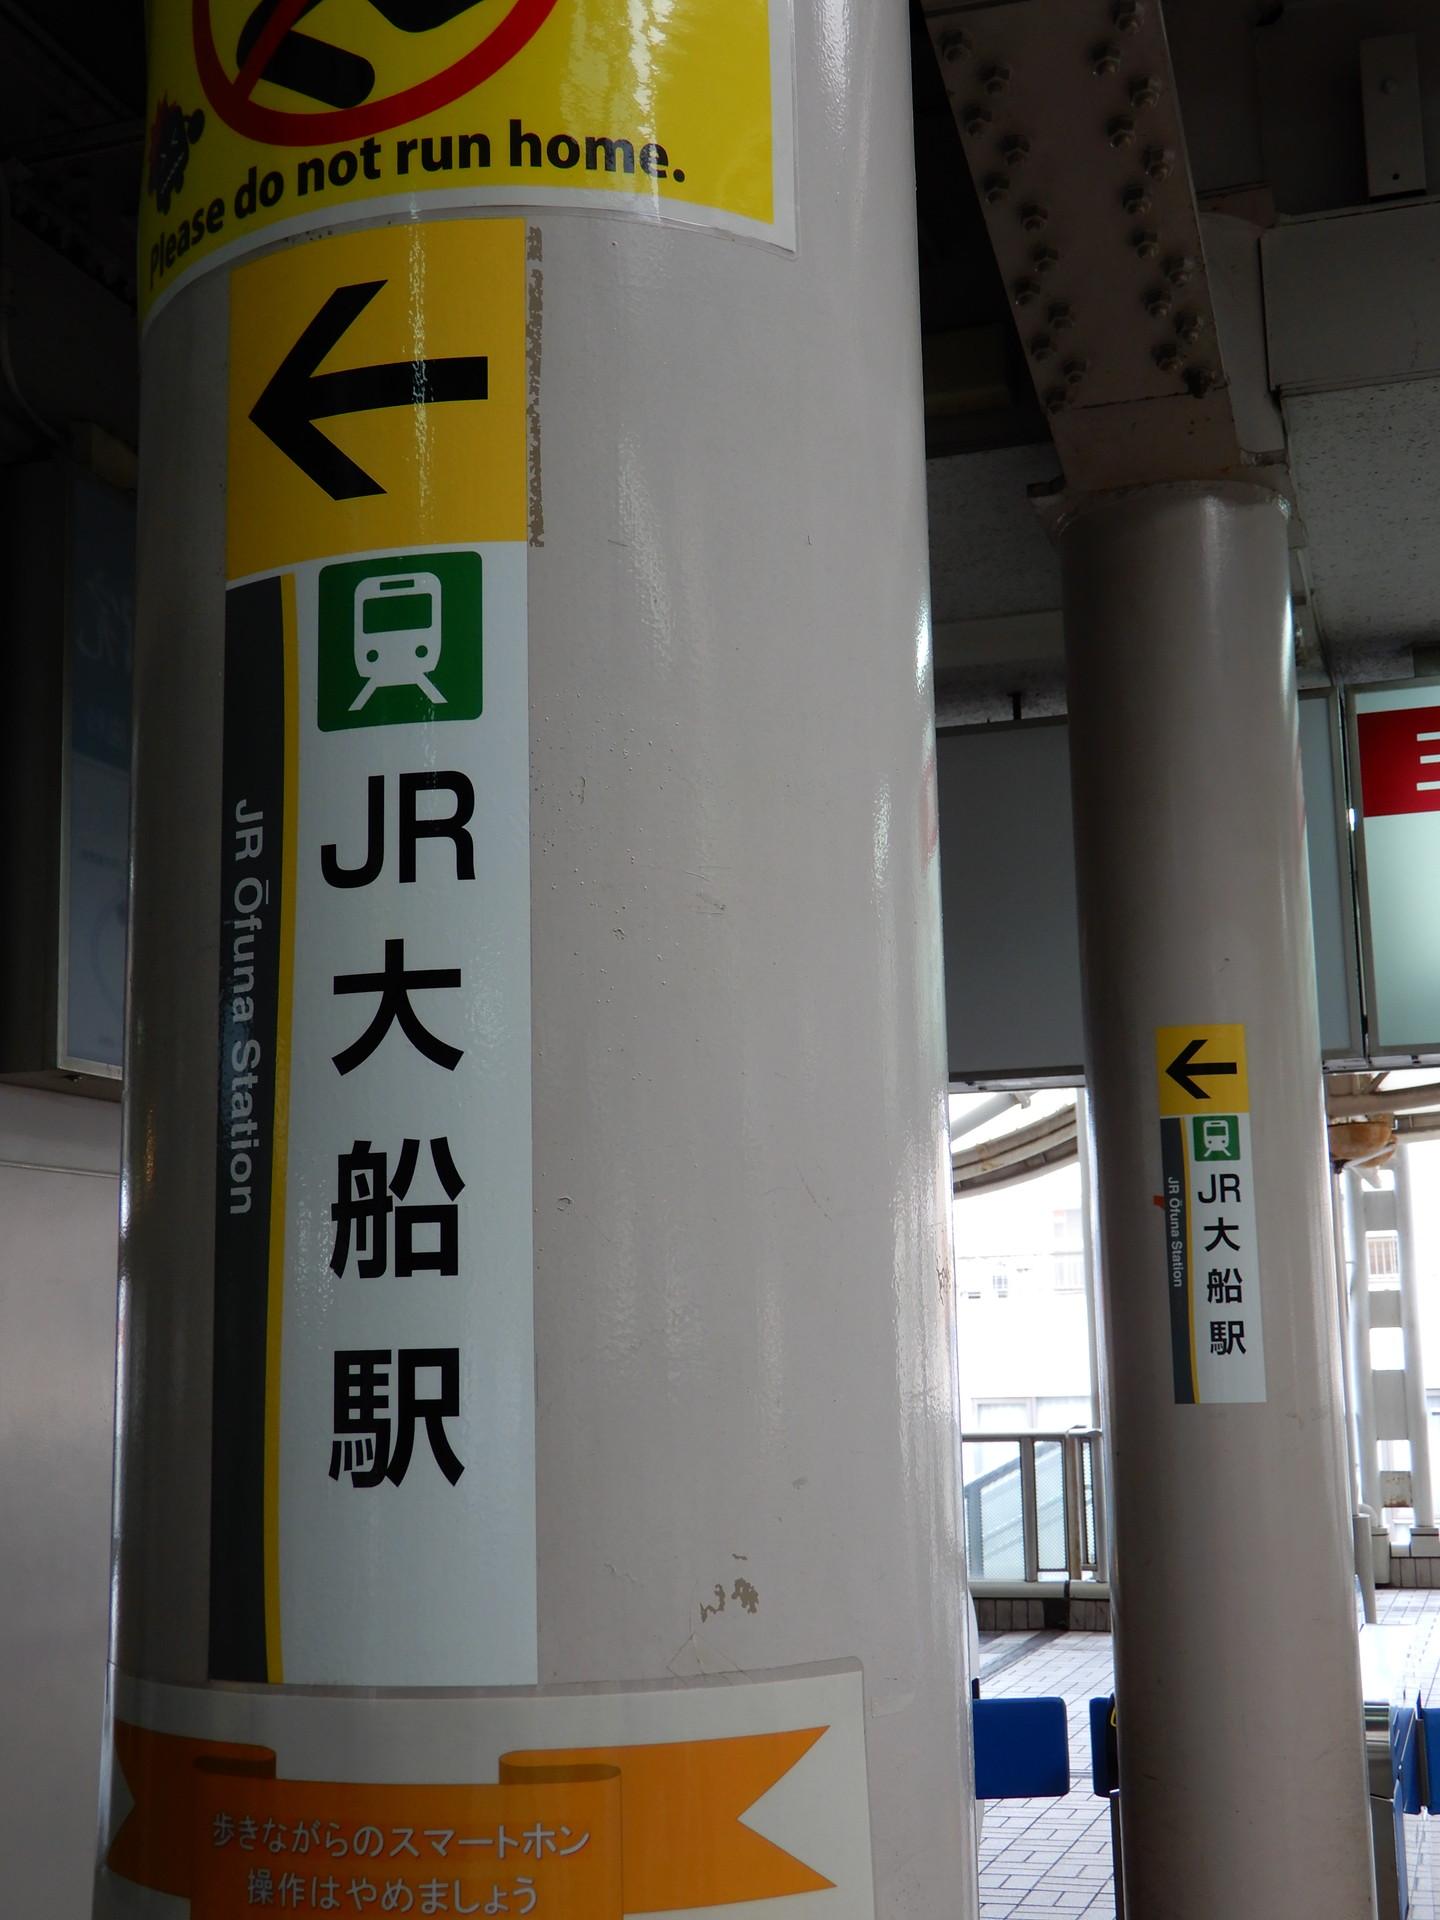 大船駅の出口案内